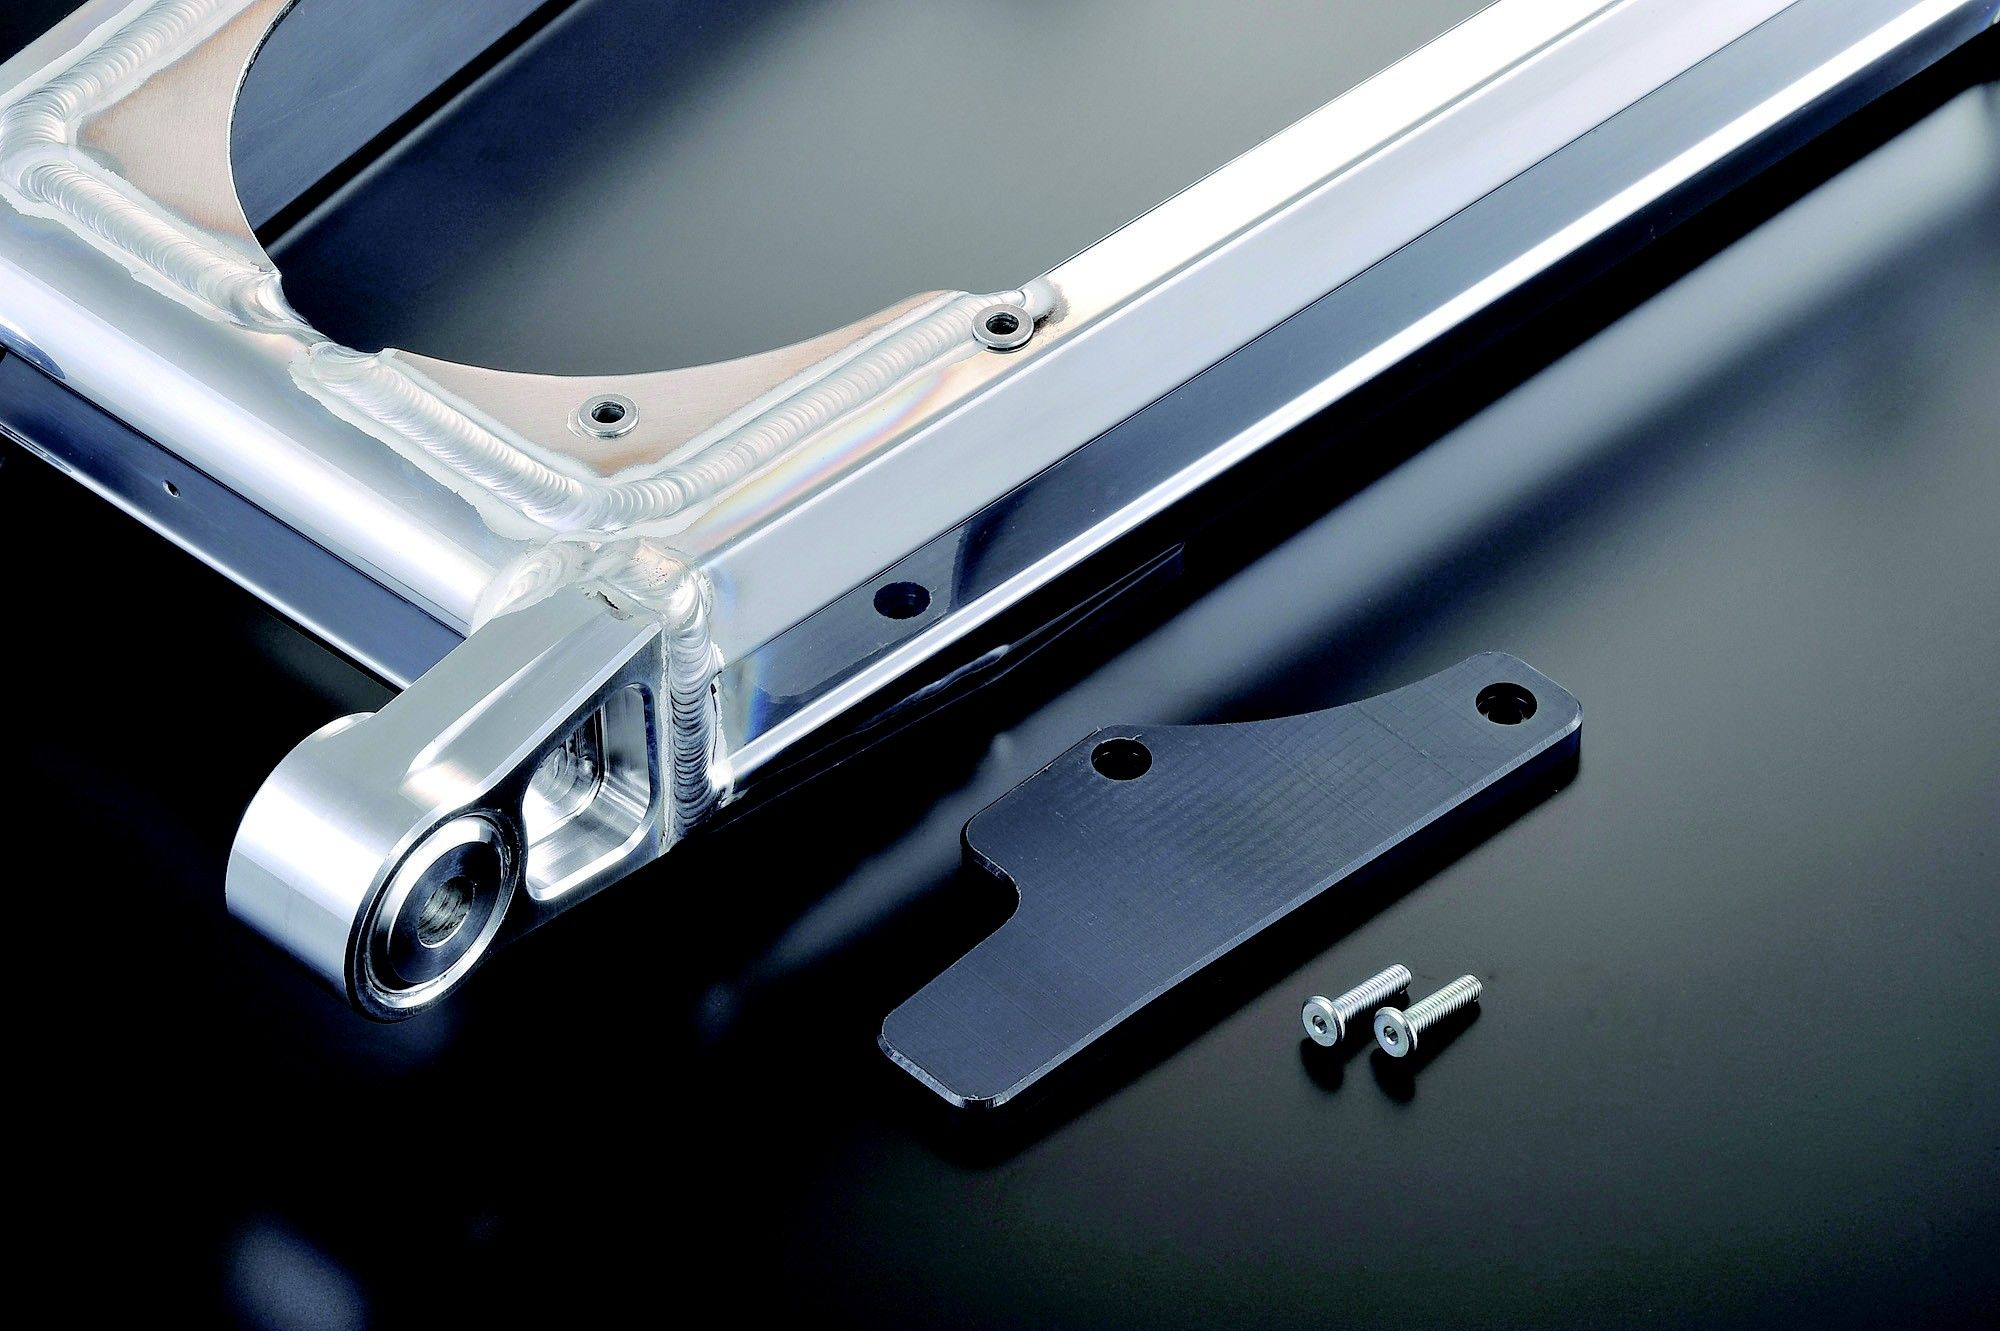 【G-Craft】NSR專用競賽型後搖臂Type1 加長2cm - 「Webike-摩托百貨」